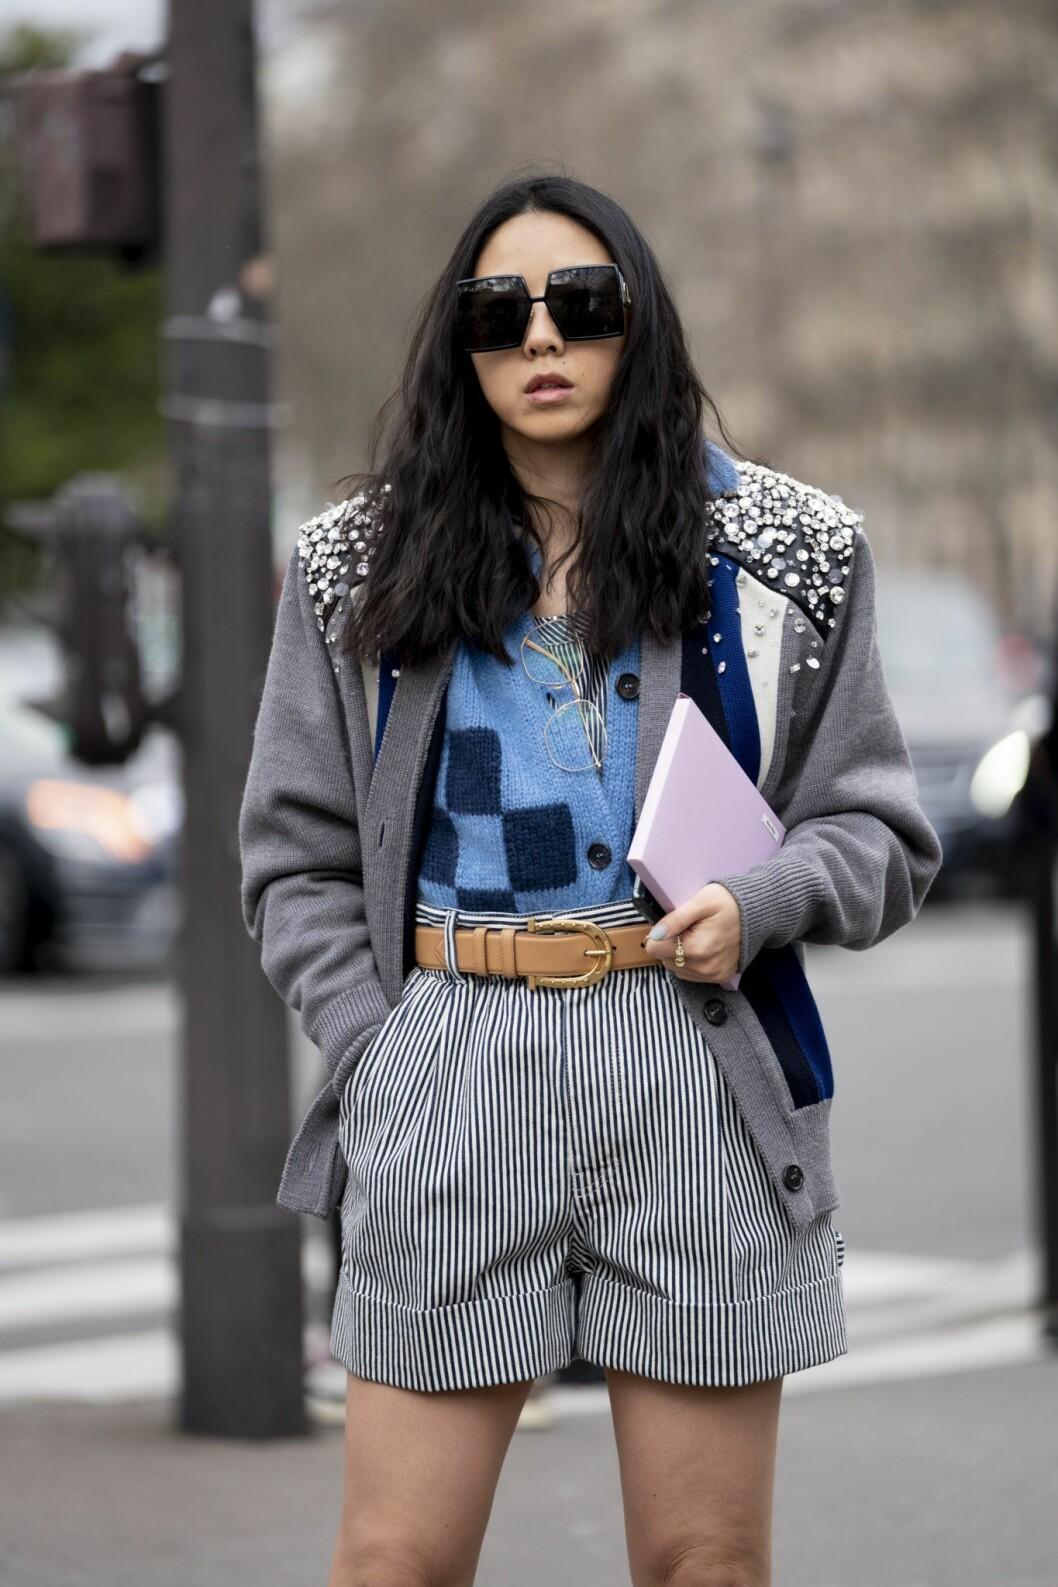 Randiga shorts Paris fashion Week AW20.